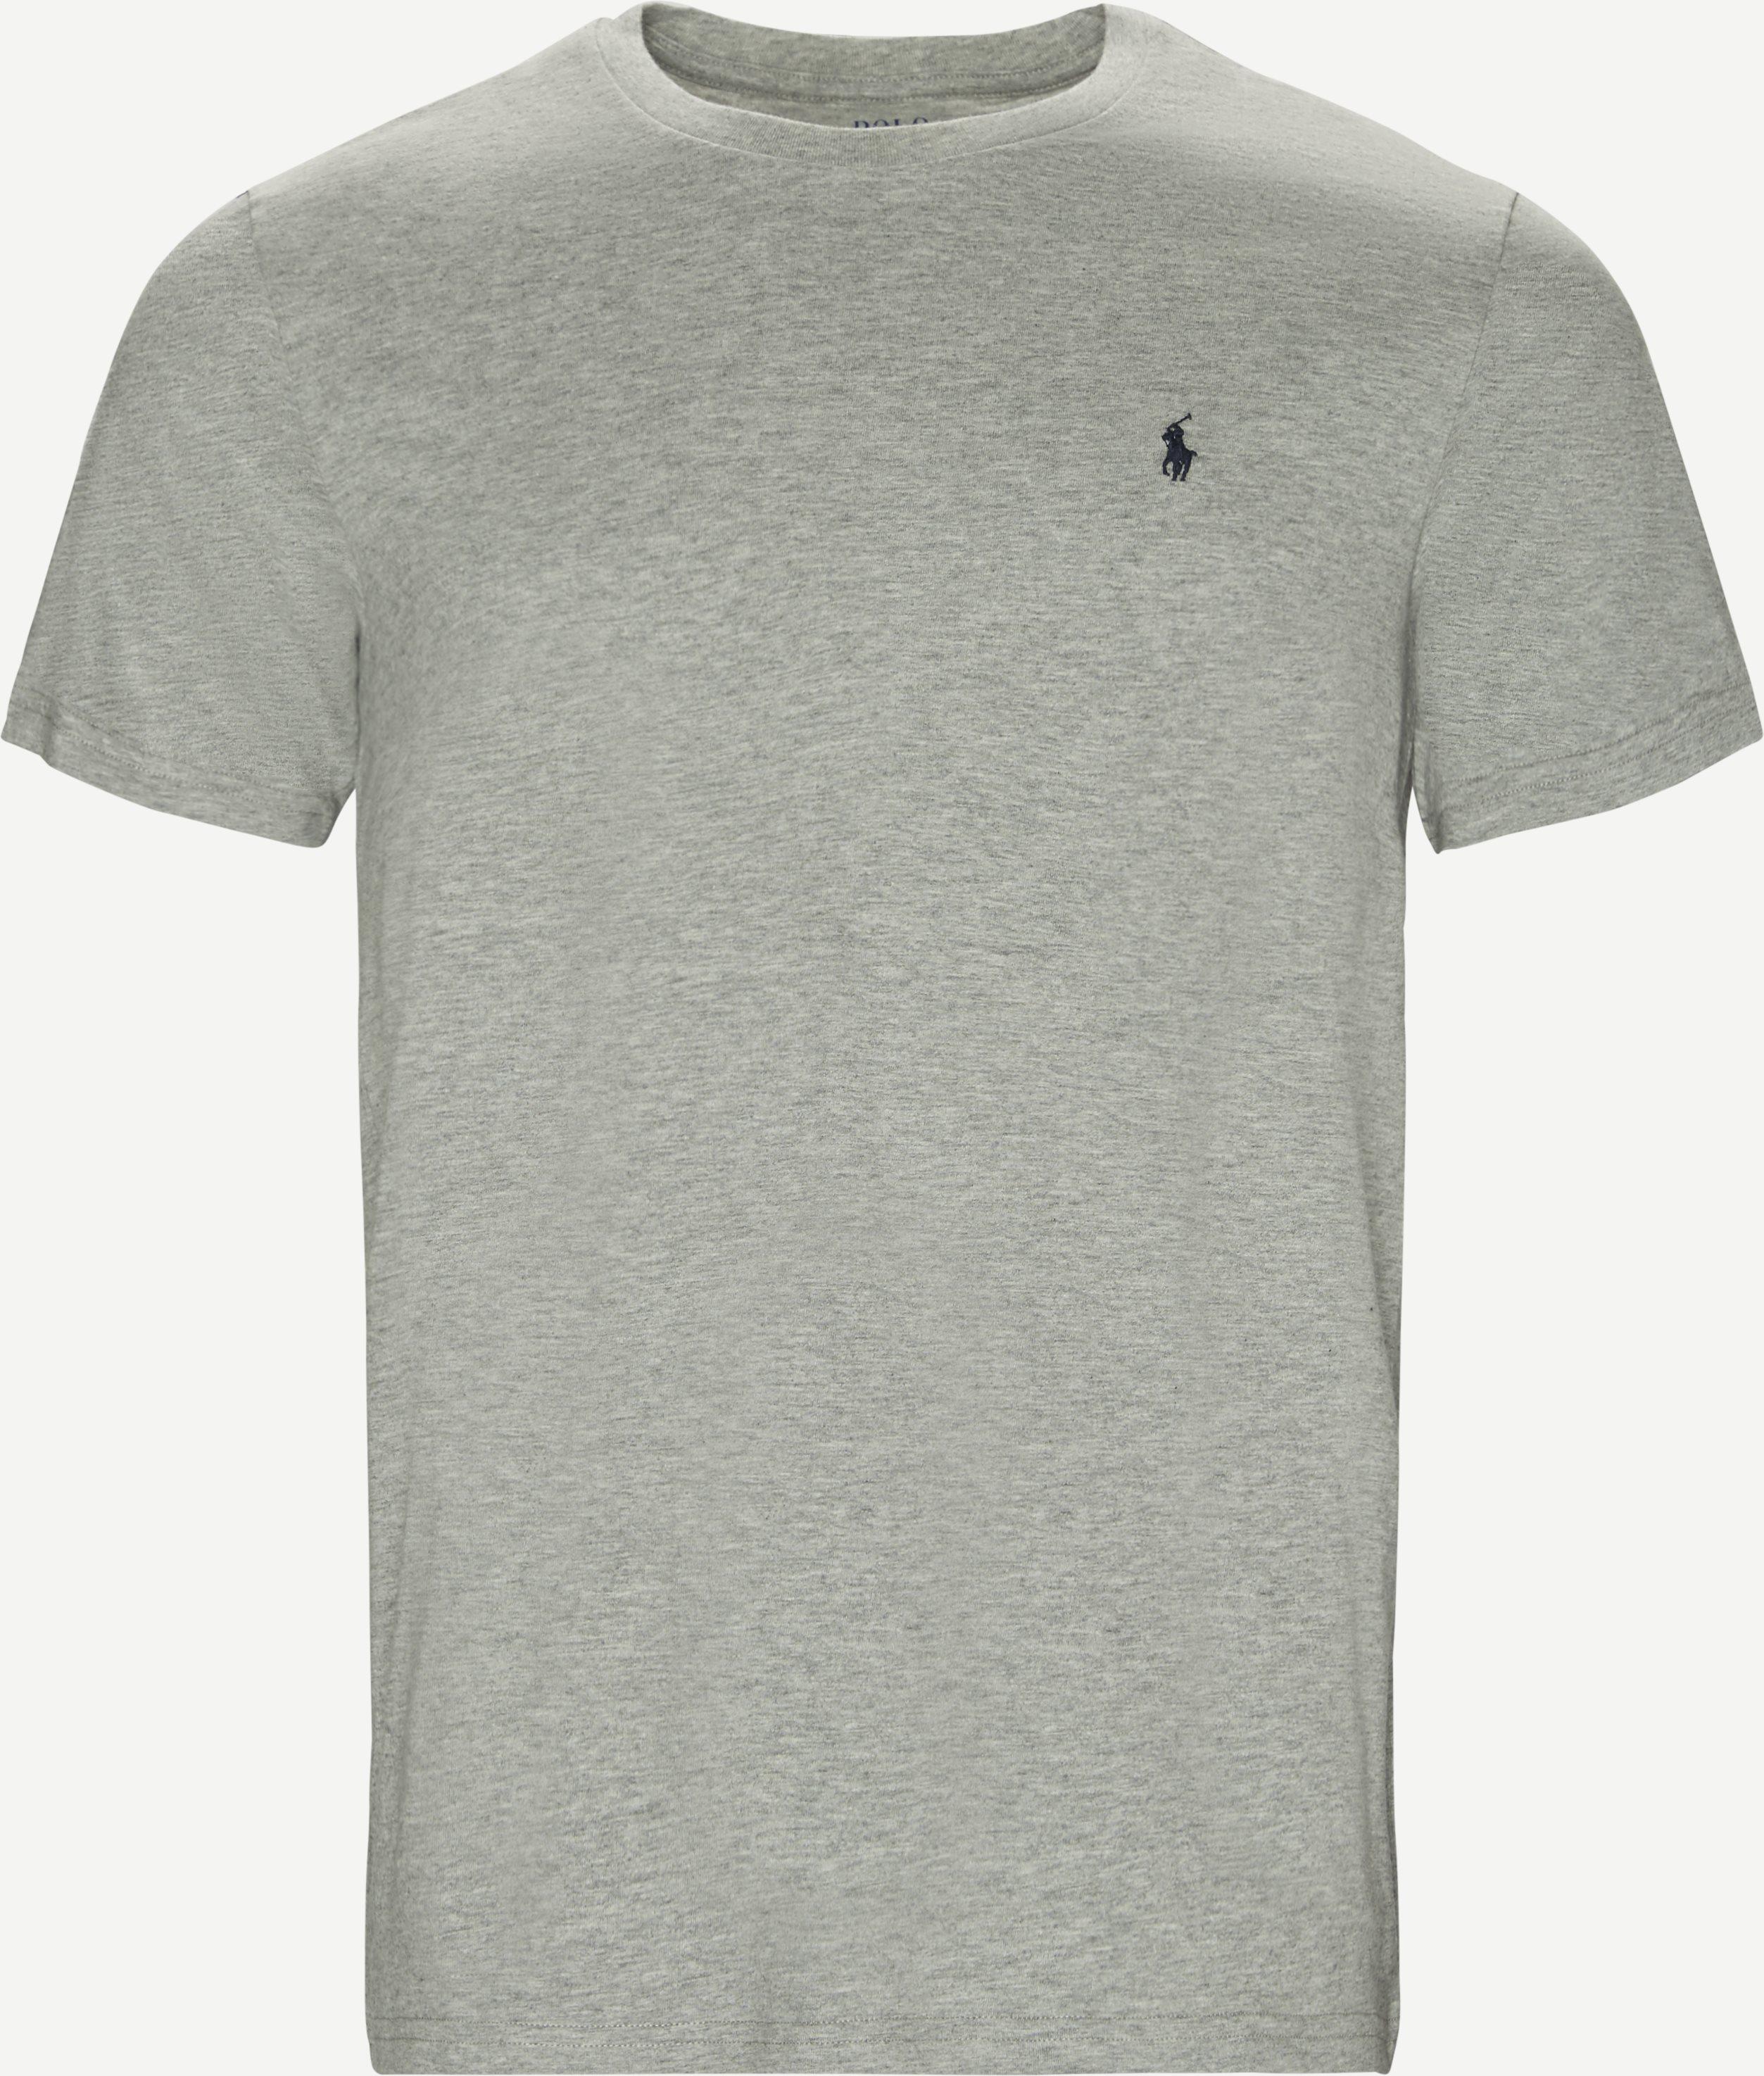 Classic Crew Neck Tee - T-shirts - Regular fit - Grå